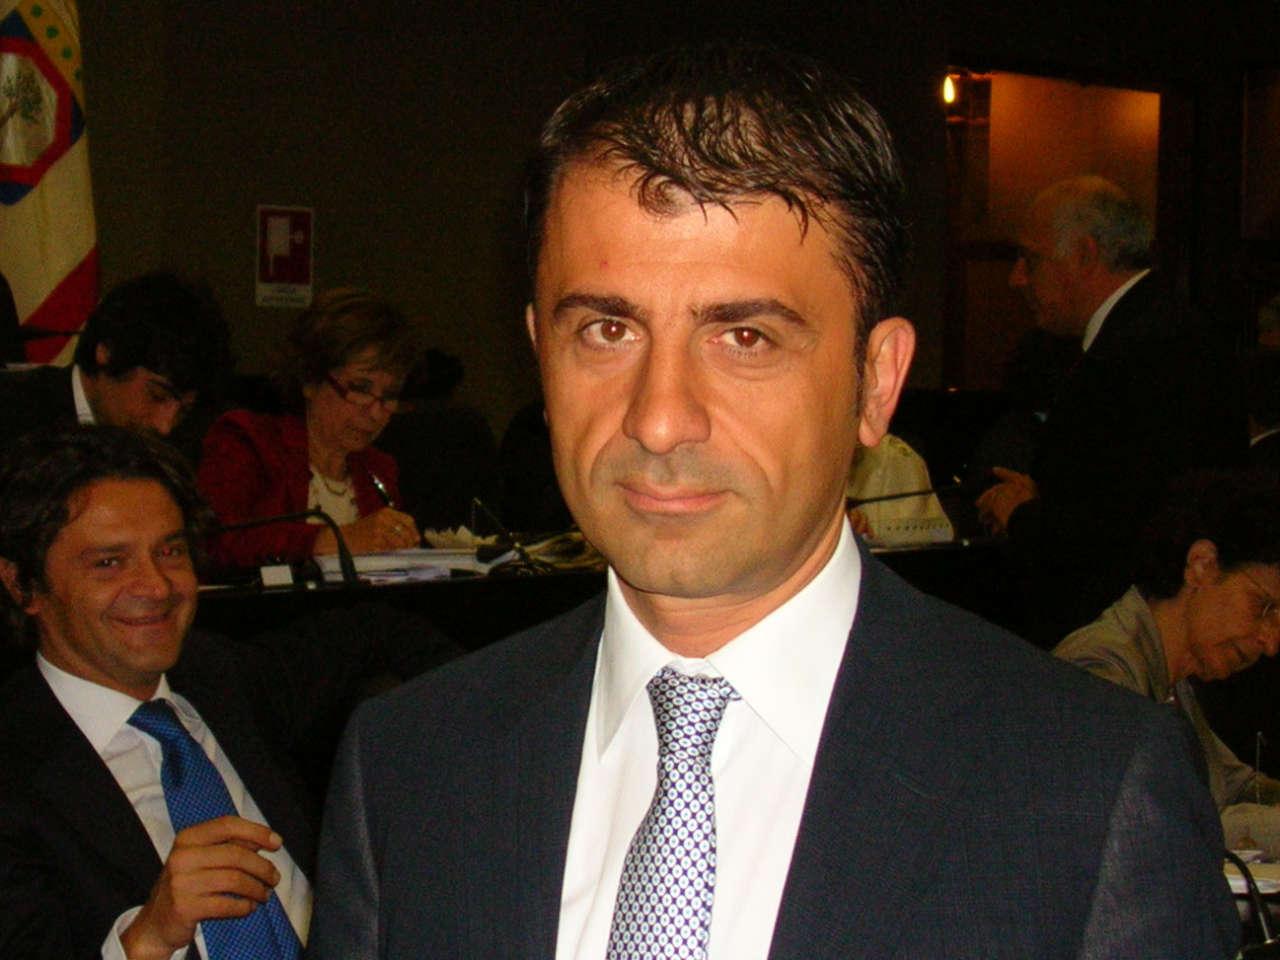 Michele Boccardi